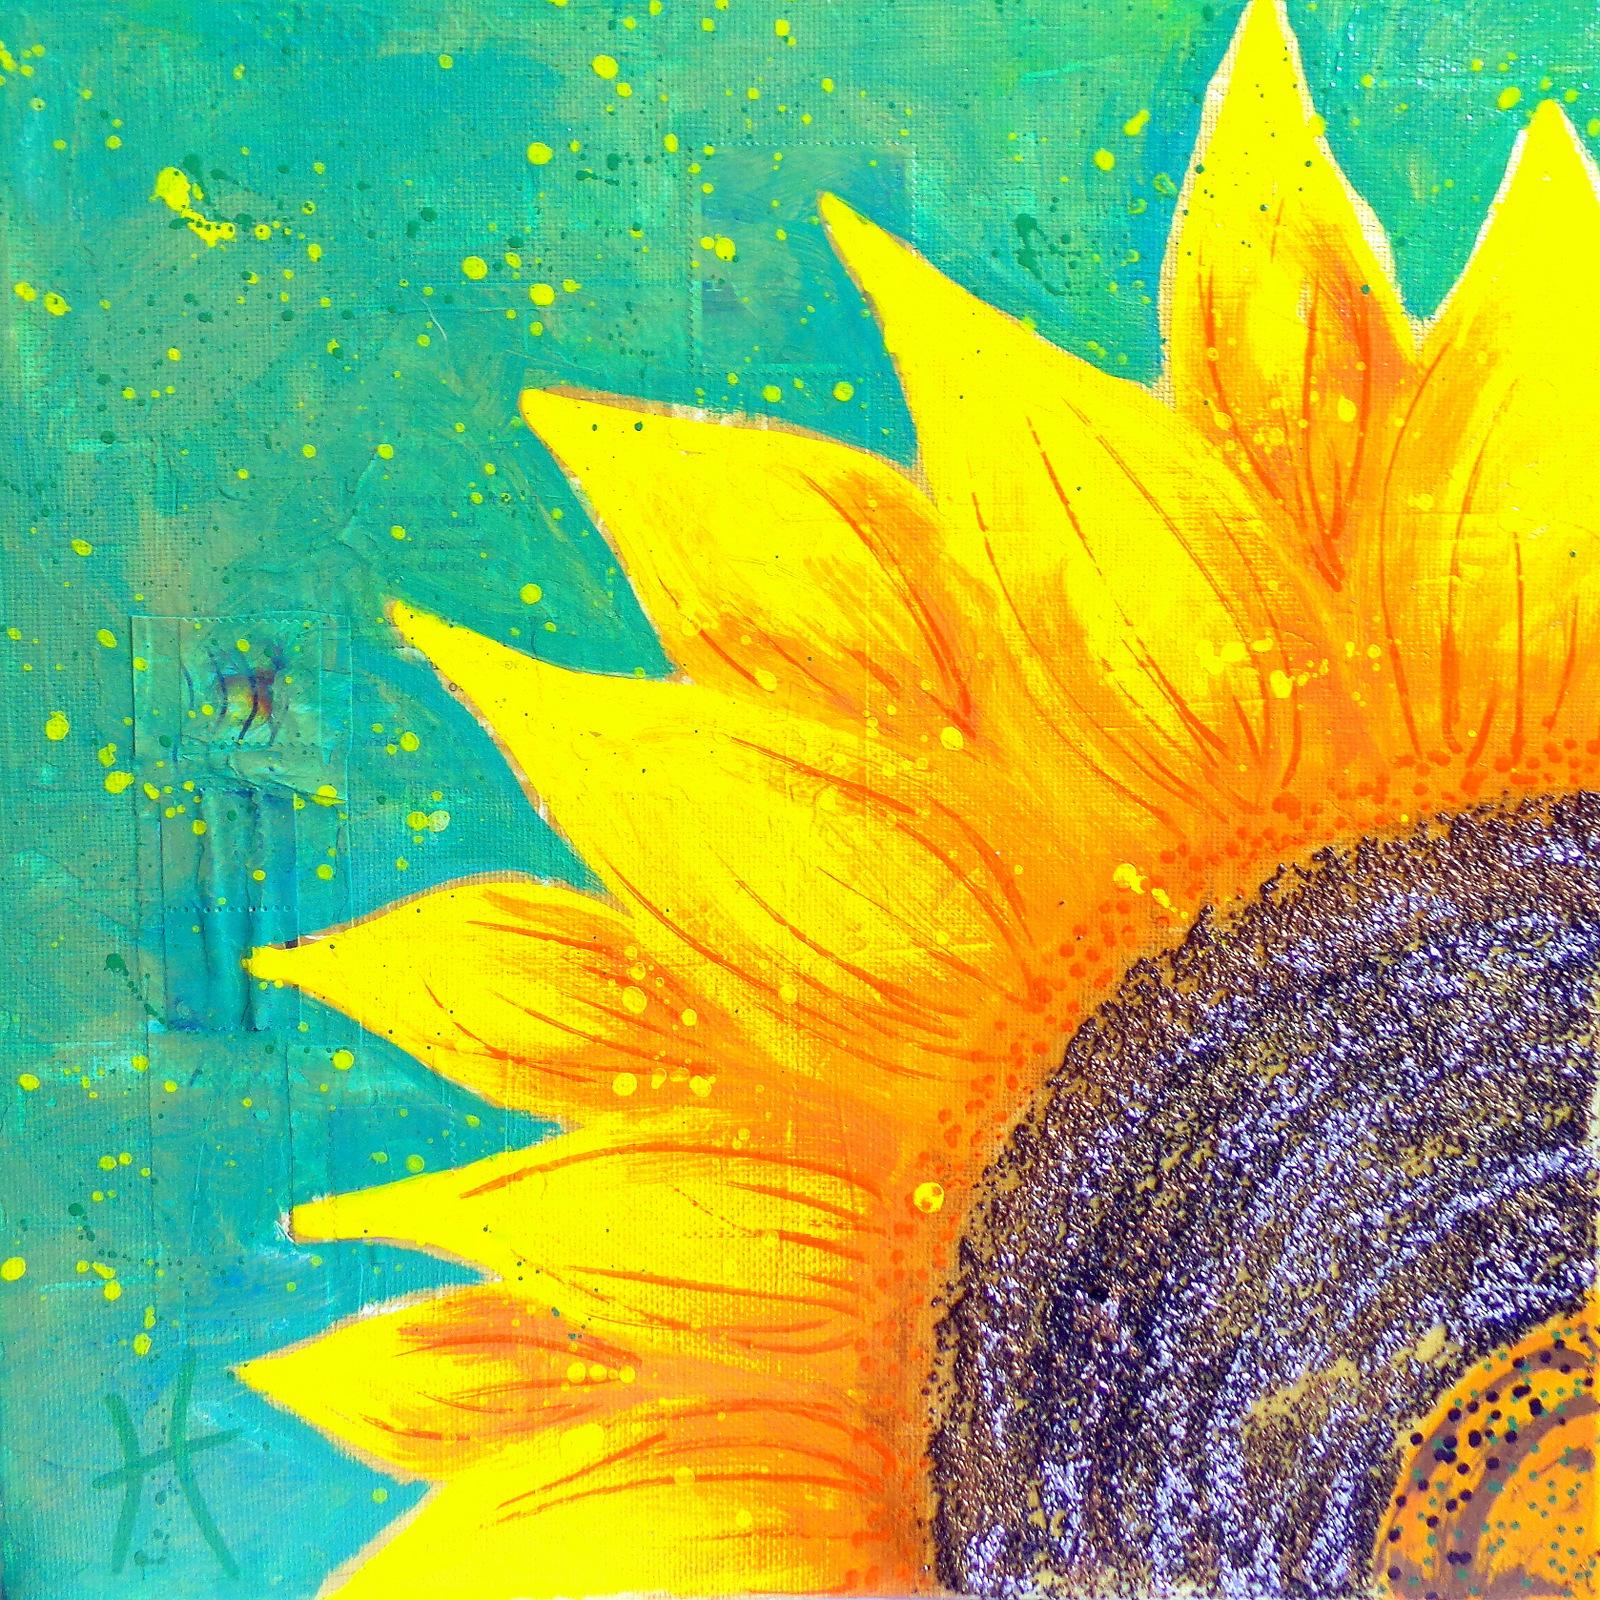 1-2018-05-21 10.19.00 Tristina Mixed Media Sunflower.jpg